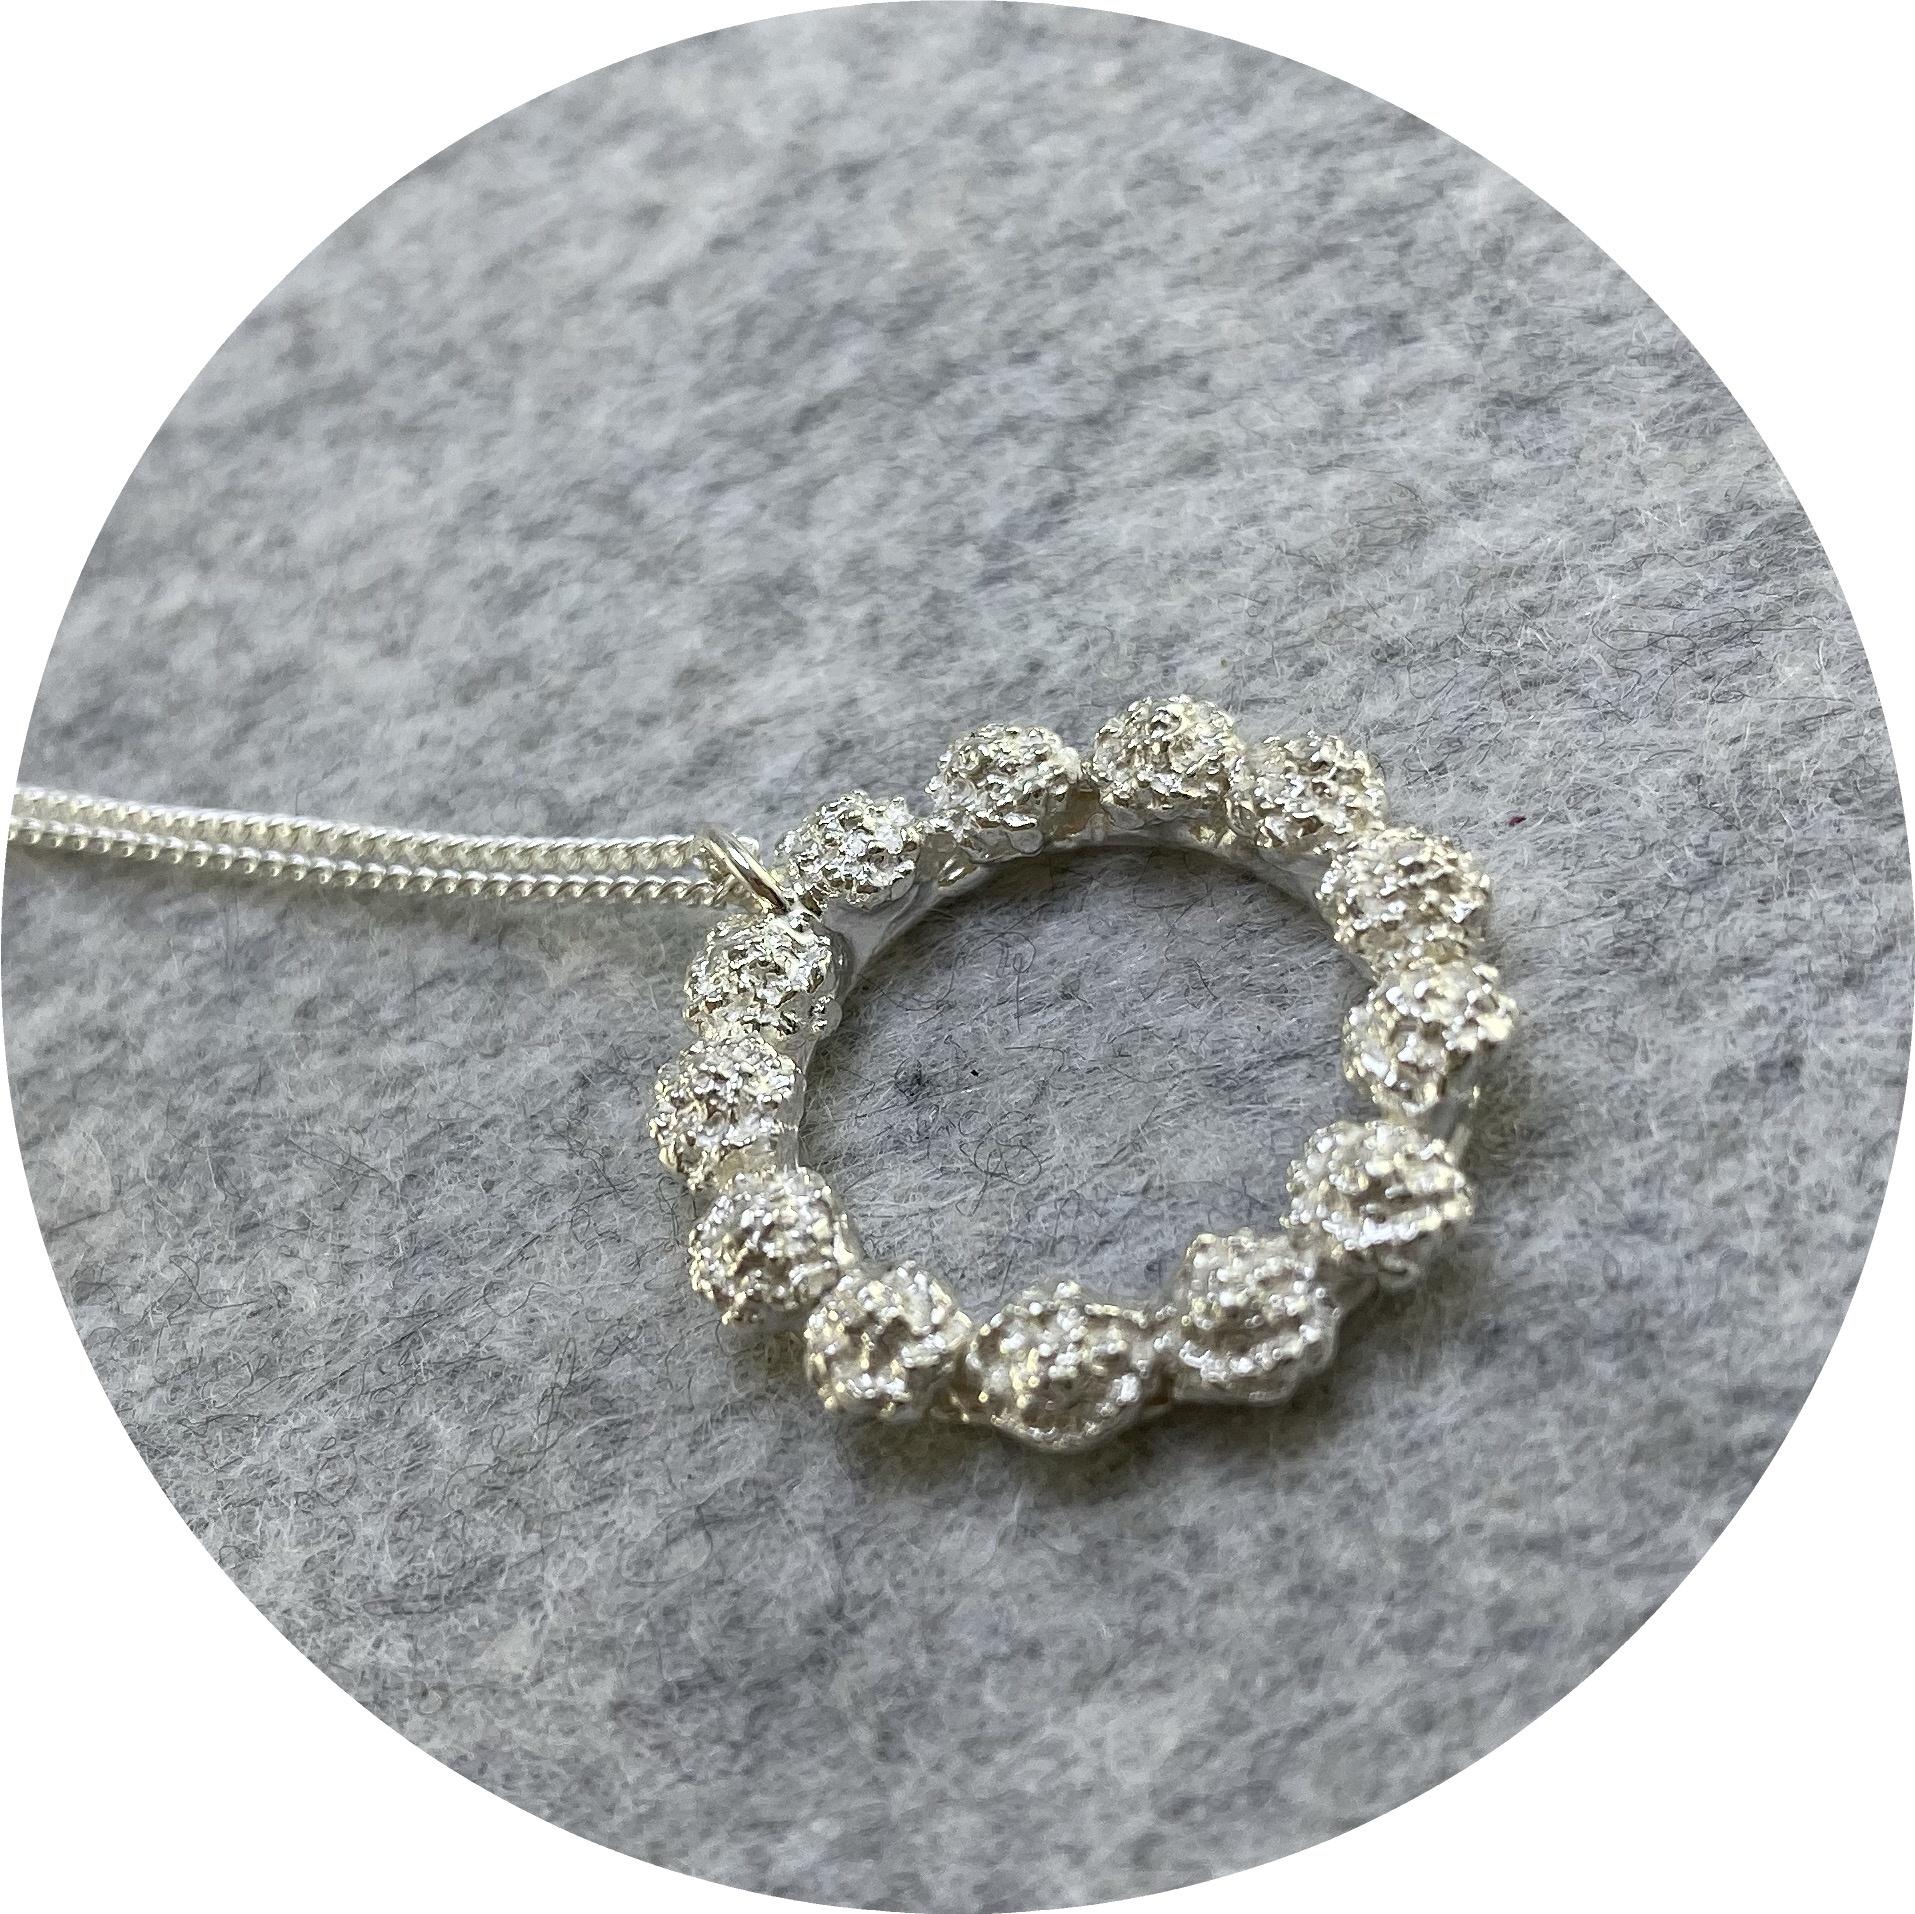 Manuela Igreja- Cushion Bush wreath pendant. Sterling silver.